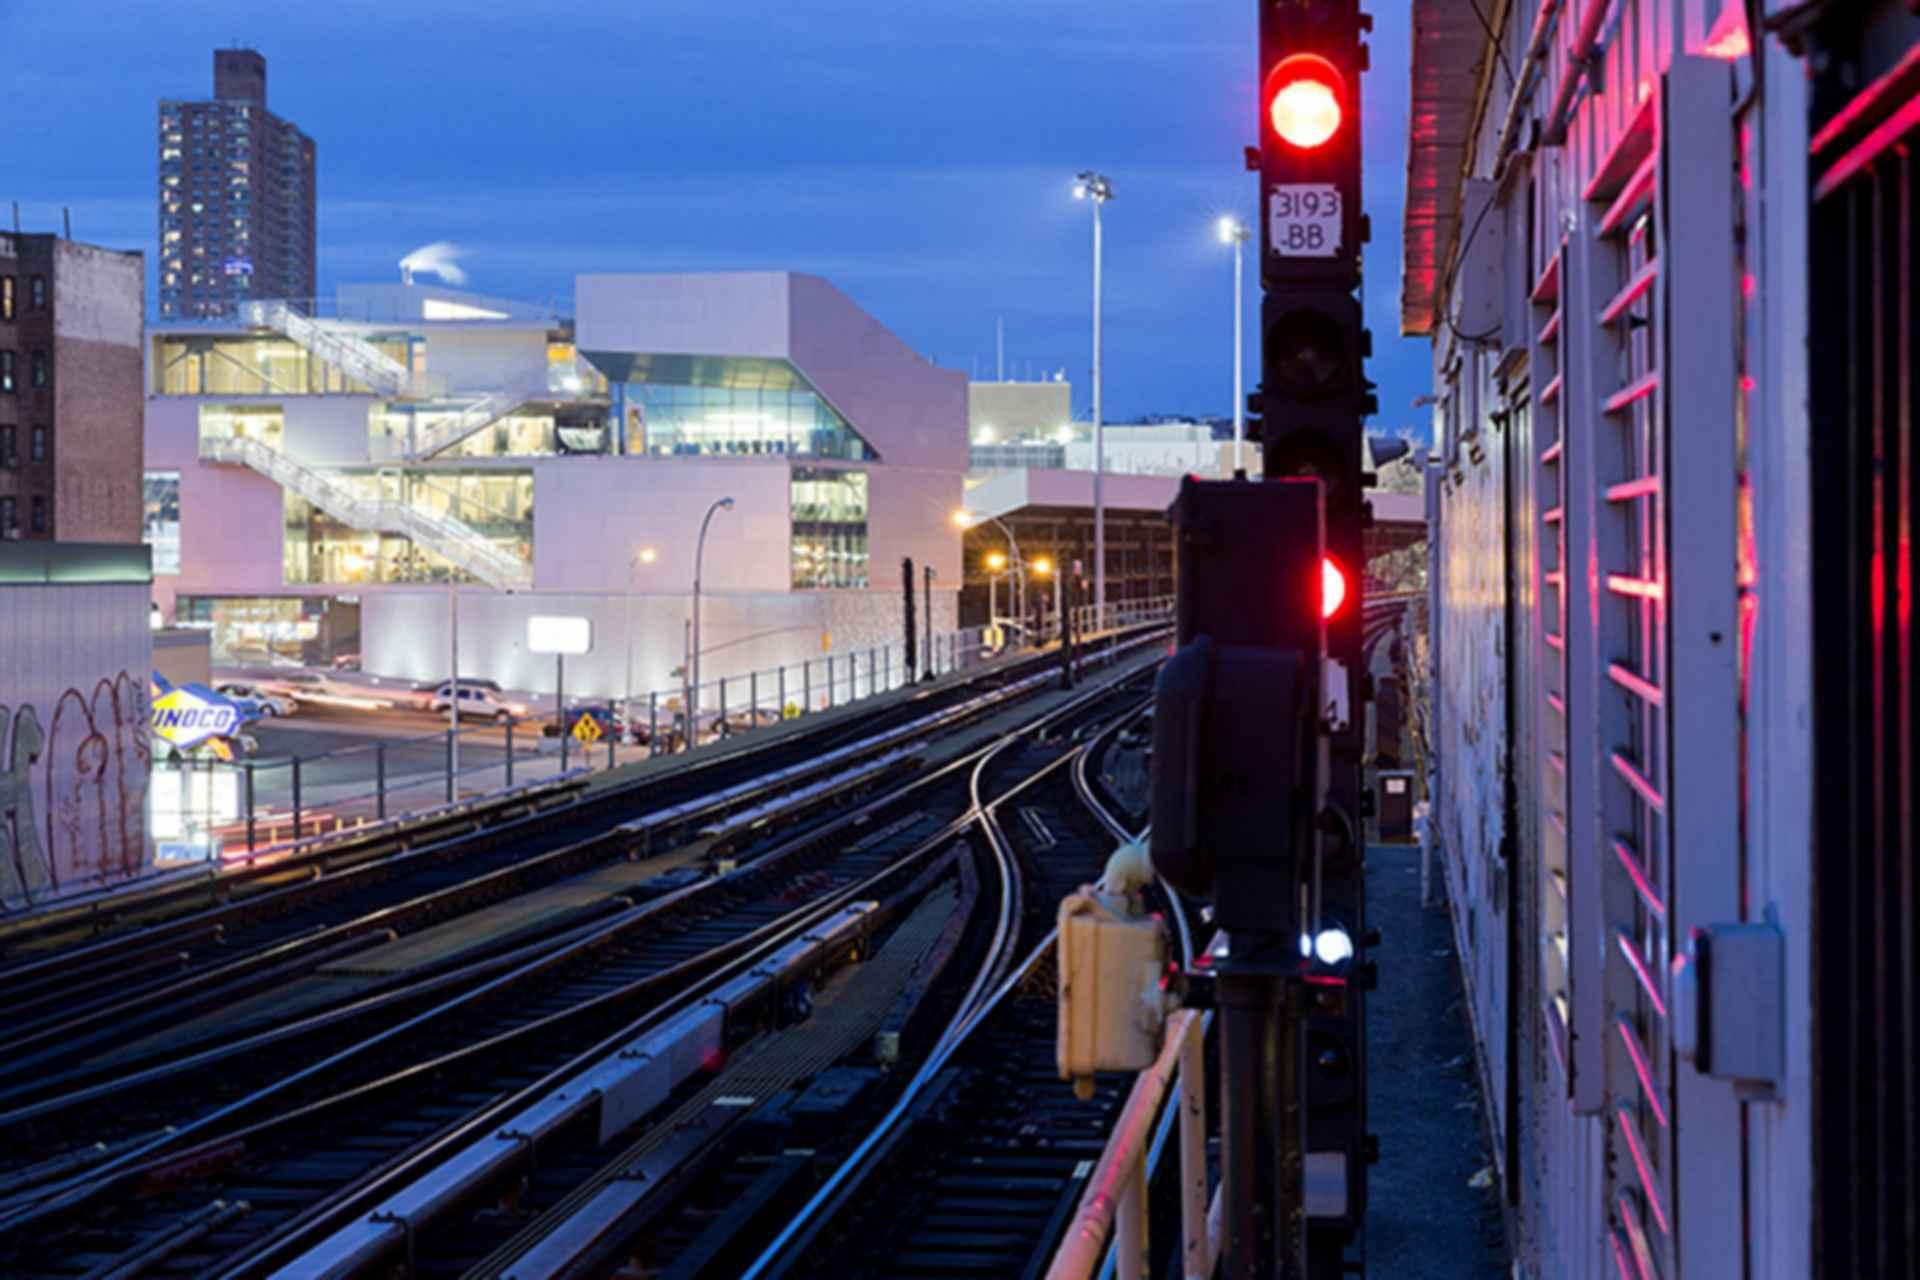 Campbell Sports Center - Exterior/Train Tracks